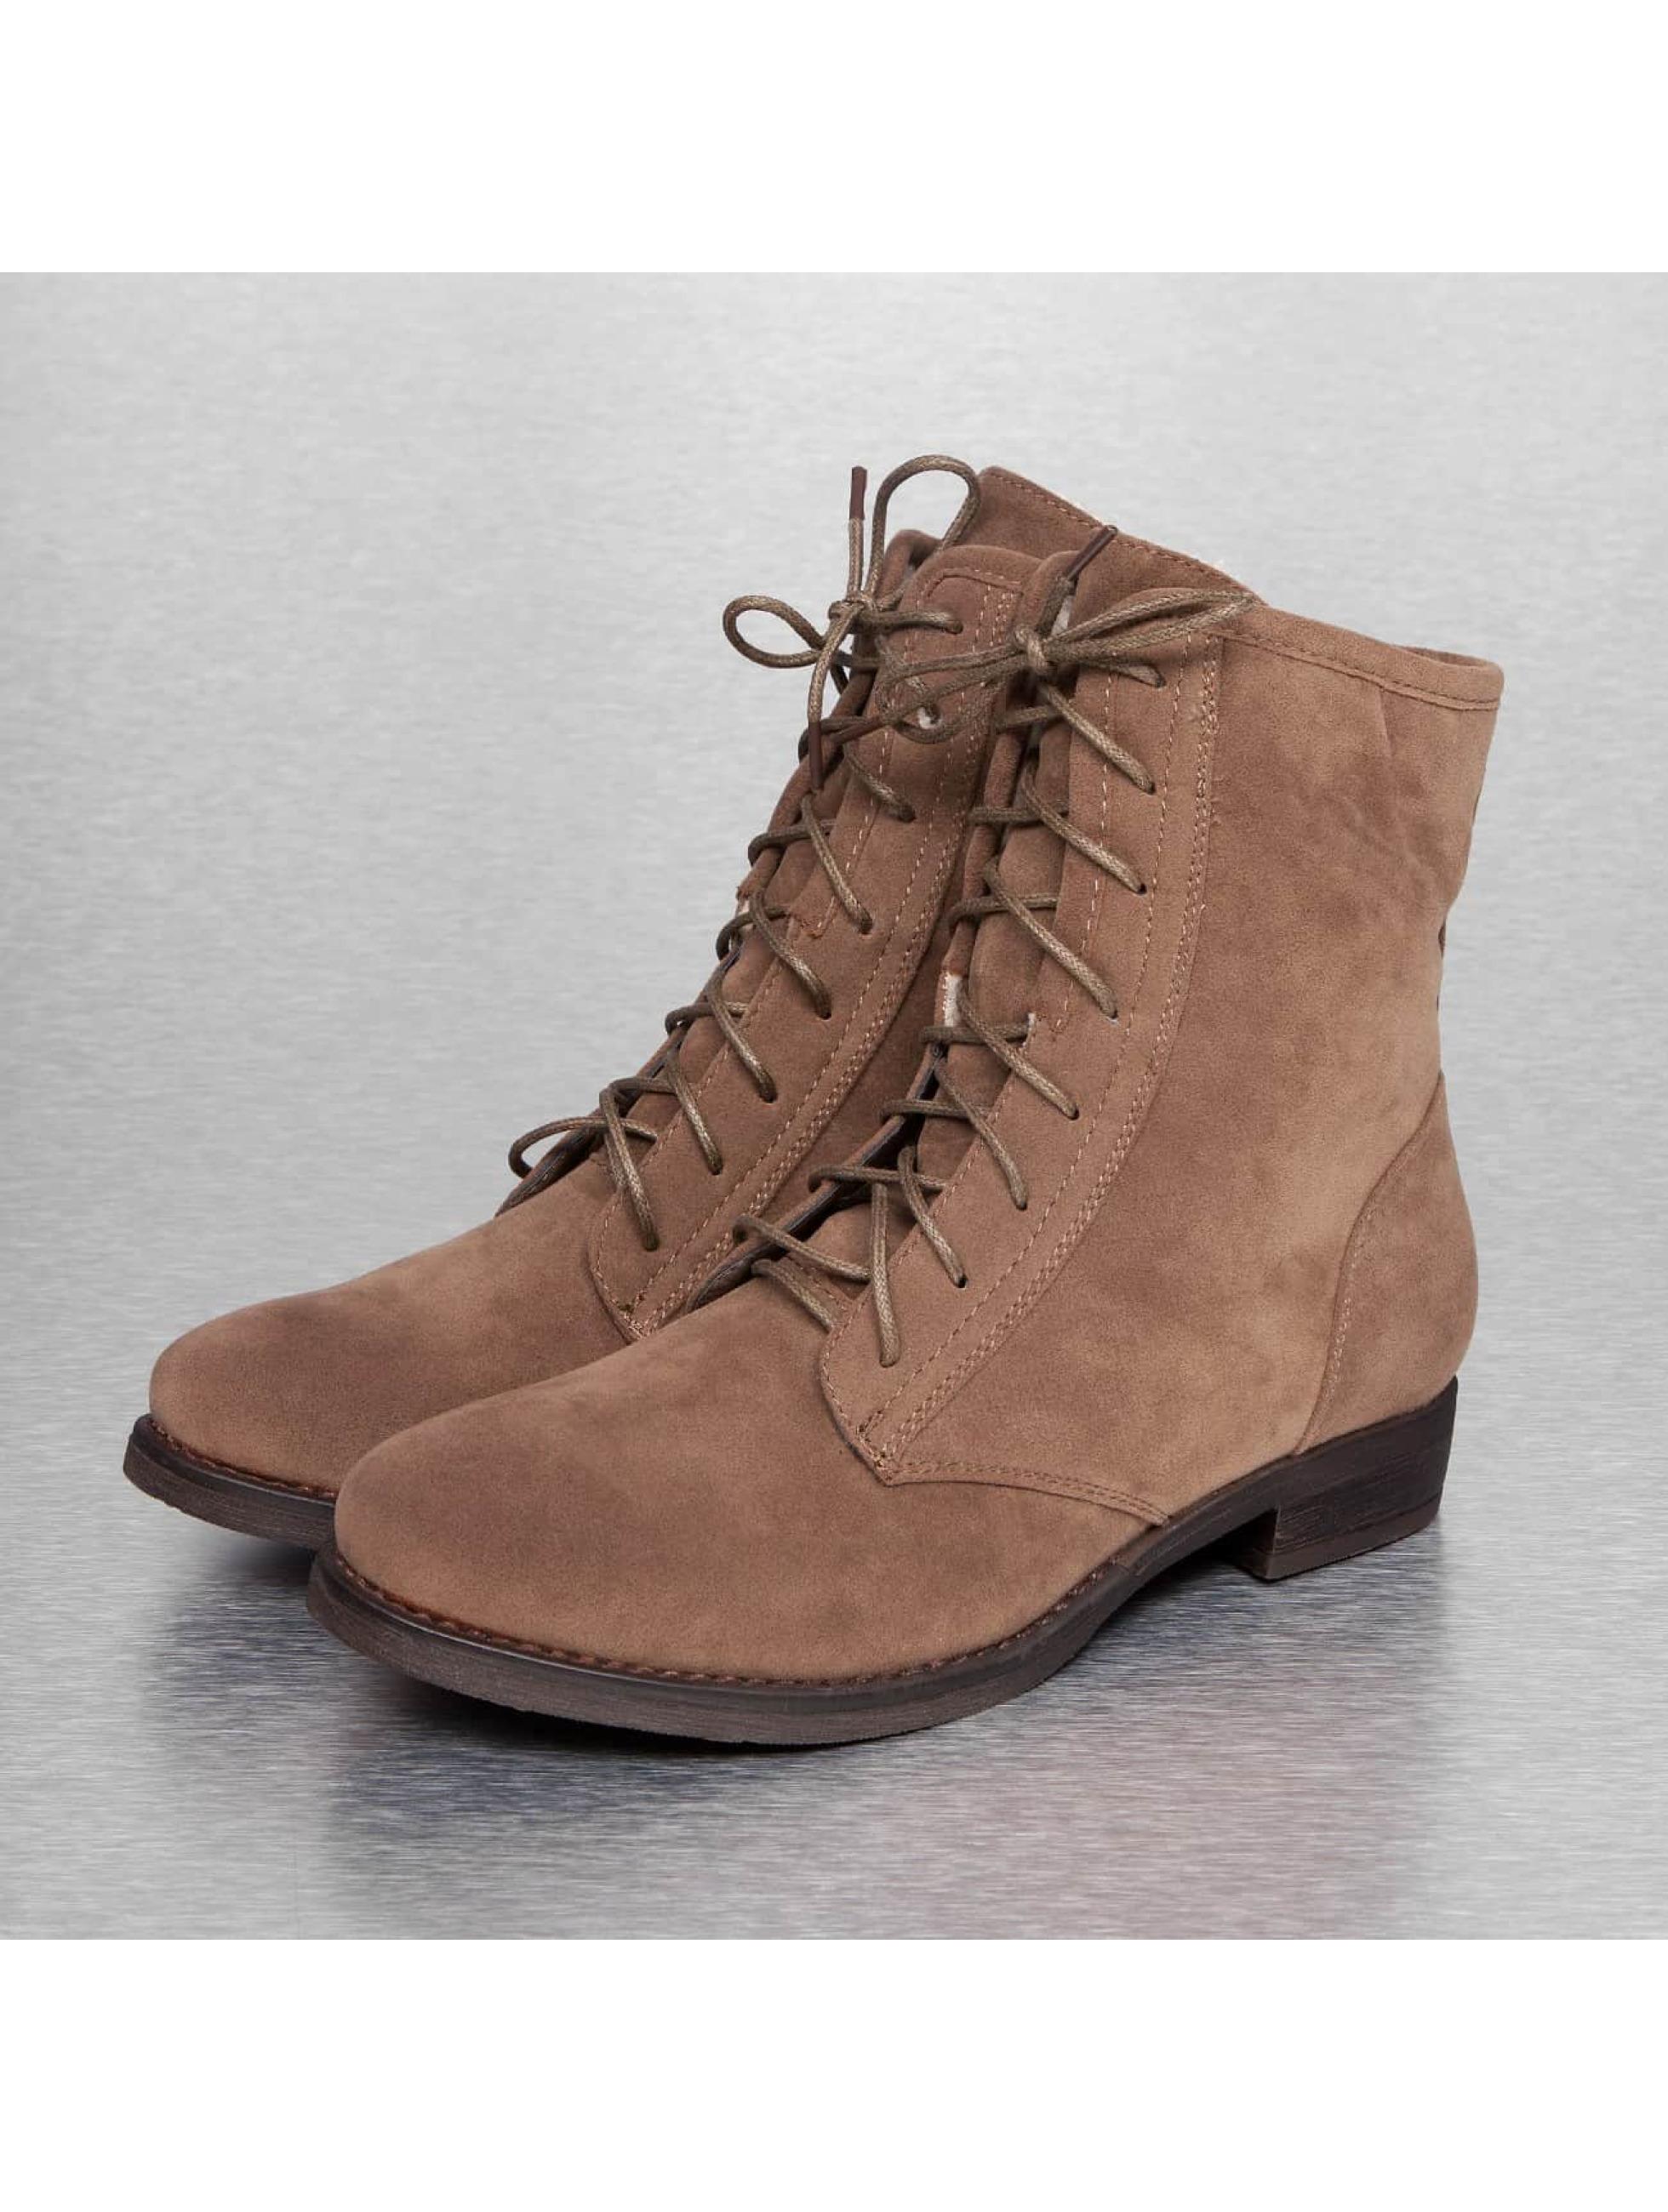 Jumex Frauen Boots Basic in khaki